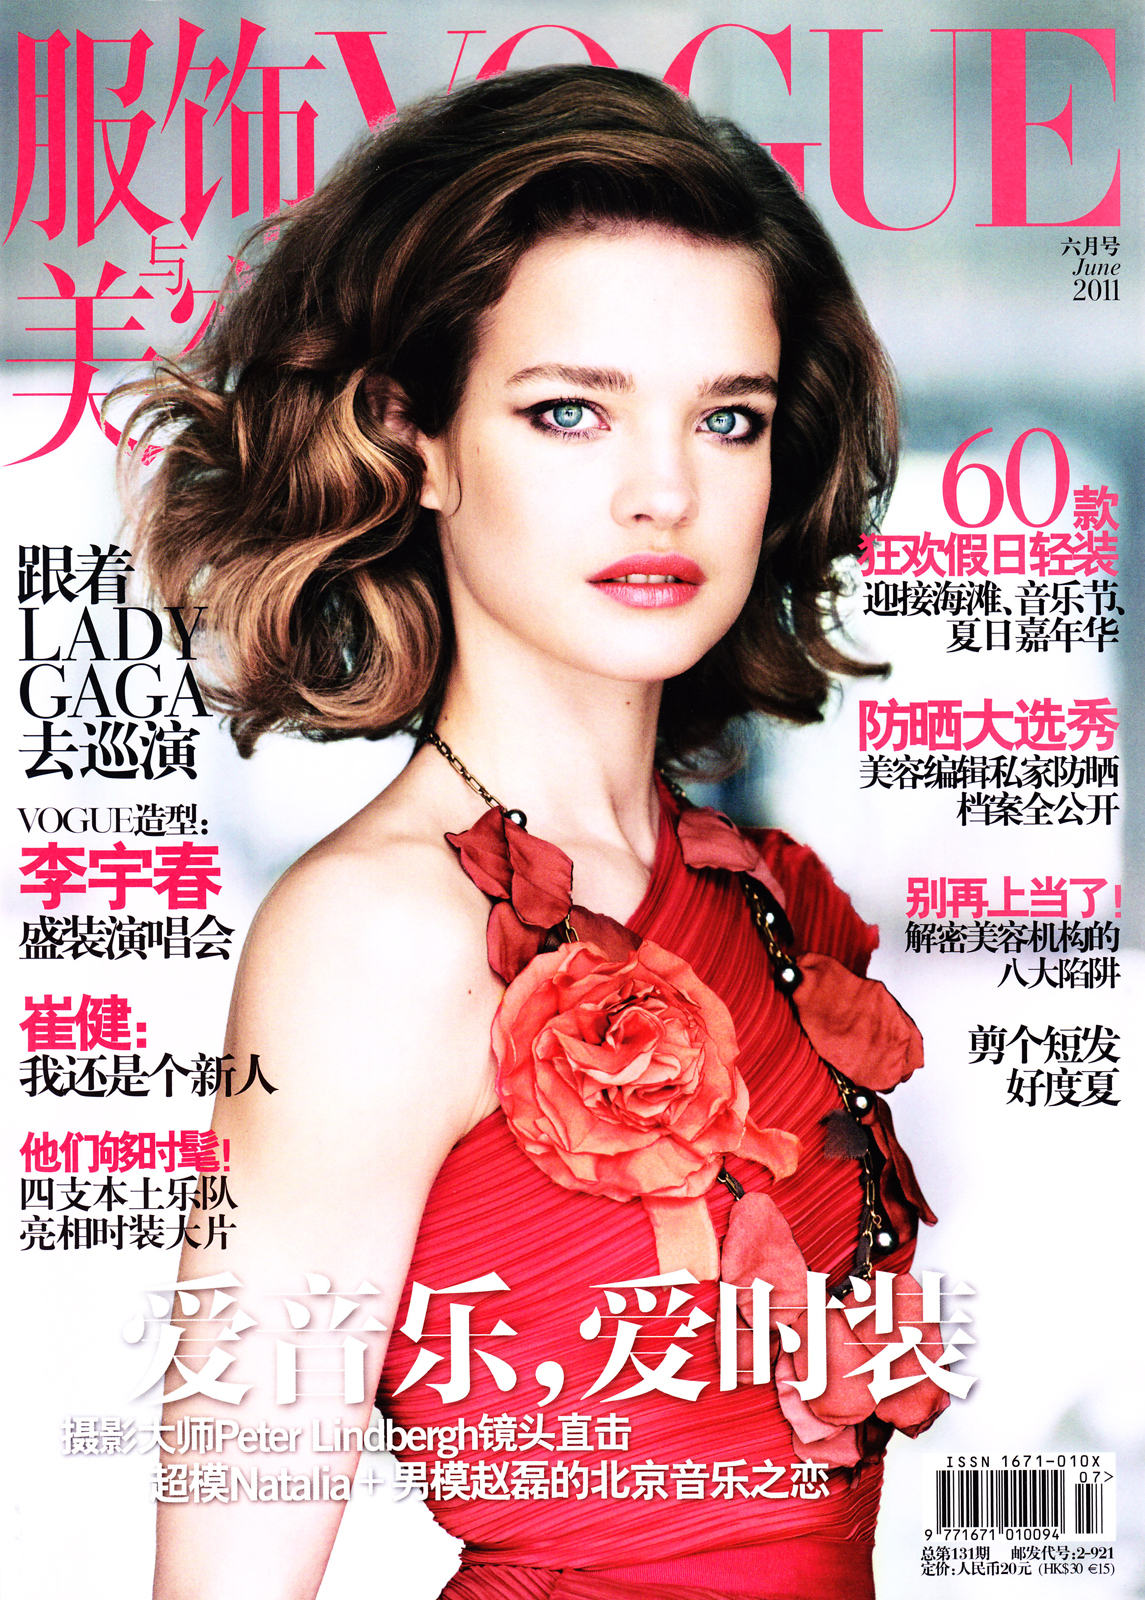 http://4.bp.blogspot.com/-8FdD8oNR5l0/TdUpCCJDq7I/AAAAAAAAIyg/oom4p4QNQ-Y/s1600/Natalia_Vodianova_Vogue_China_June_2011_Cover.jpg